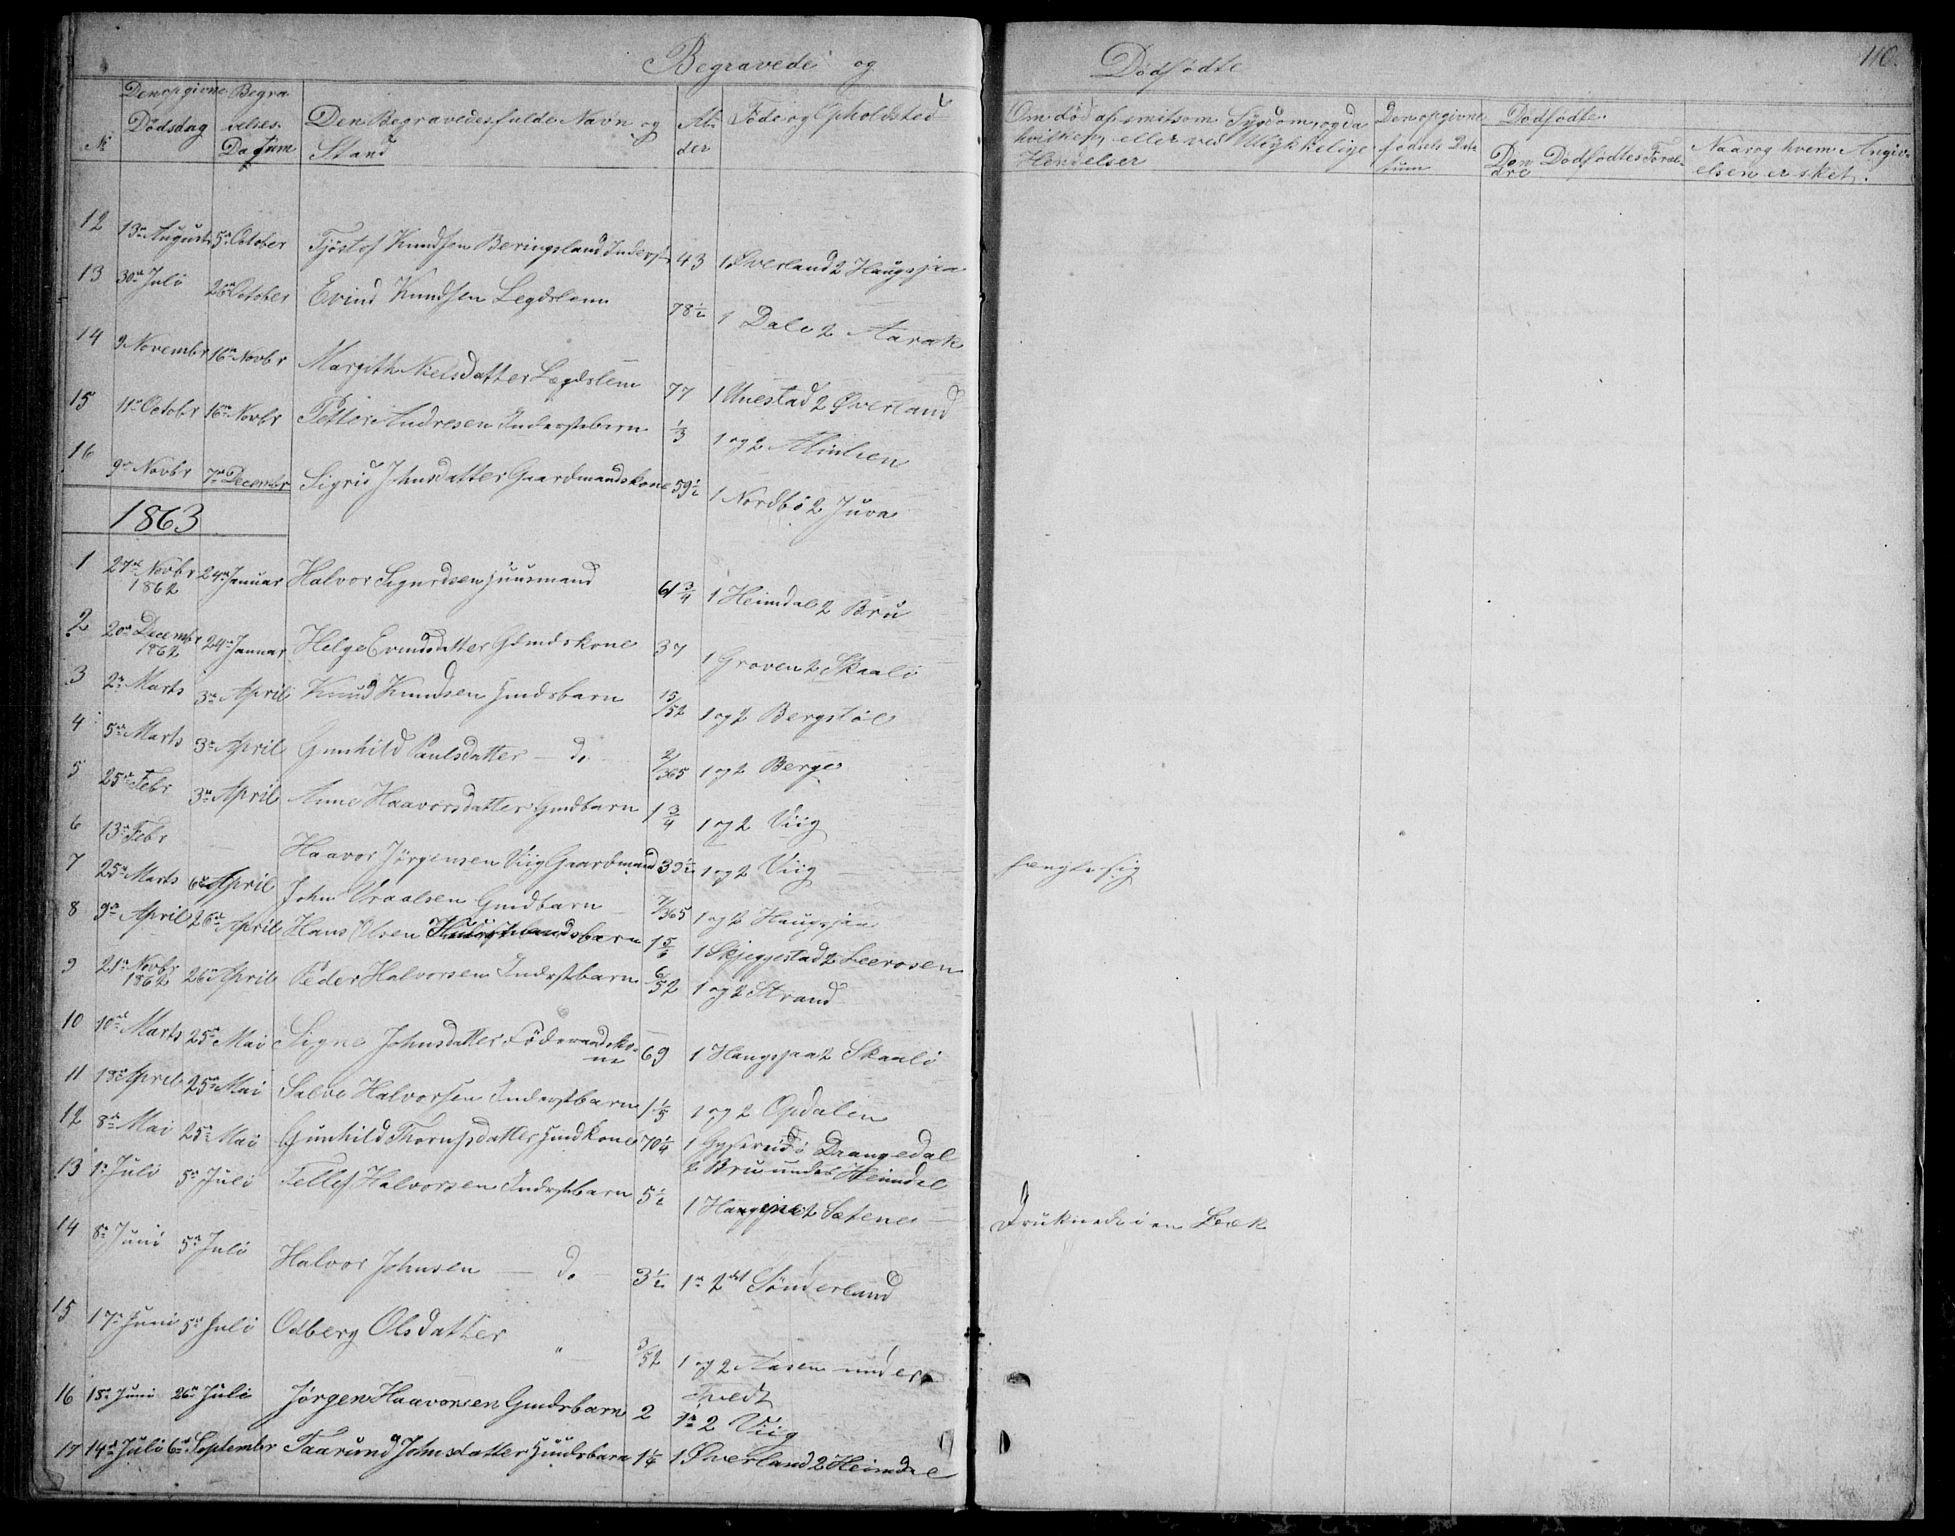 SAKO, Nissedal kirkebøker, G/Gb/L0002: Klokkerbok nr. II 2, 1863-1892, s. 110